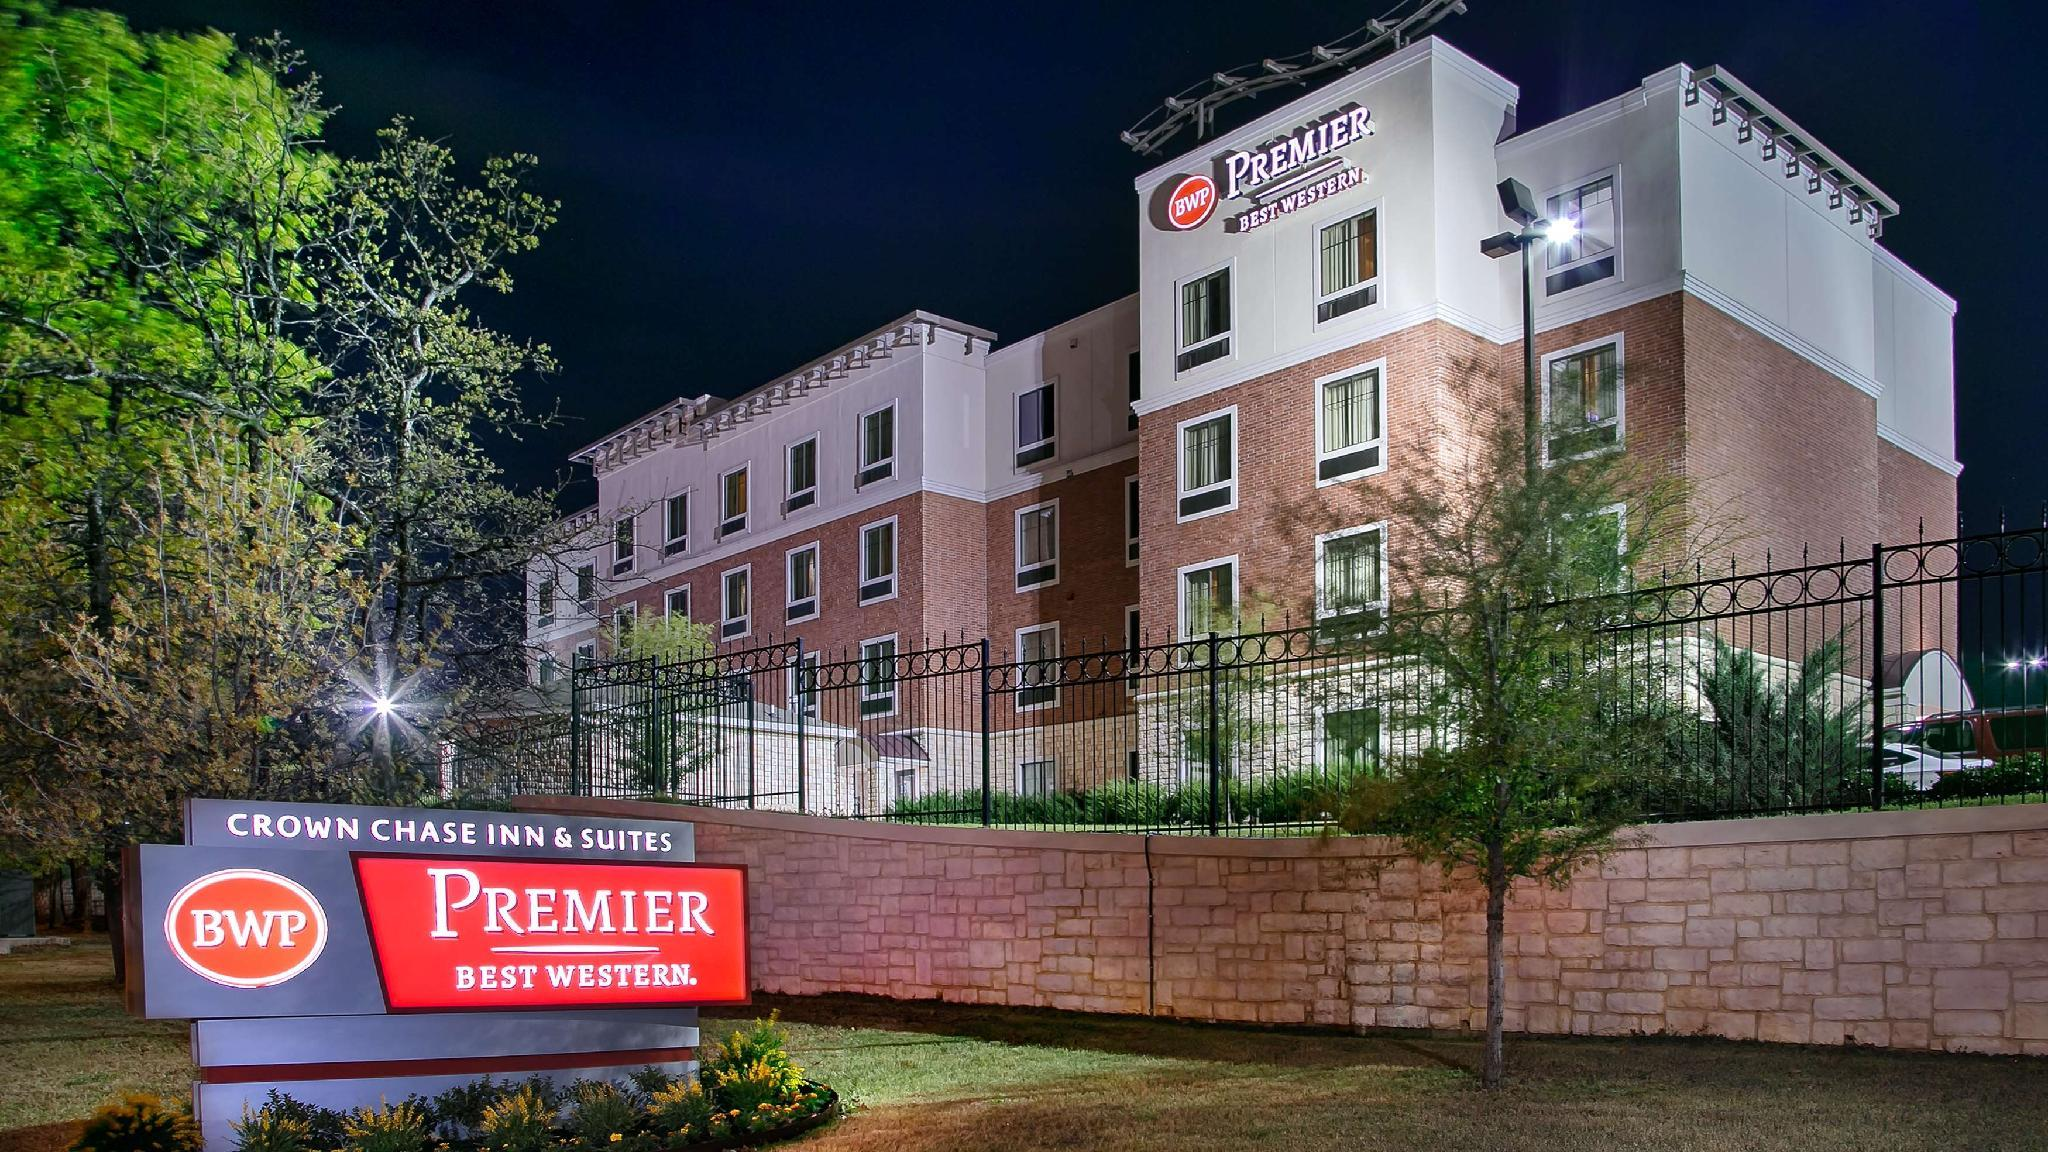 Best Western Premier Crown Chase Inn And Suites